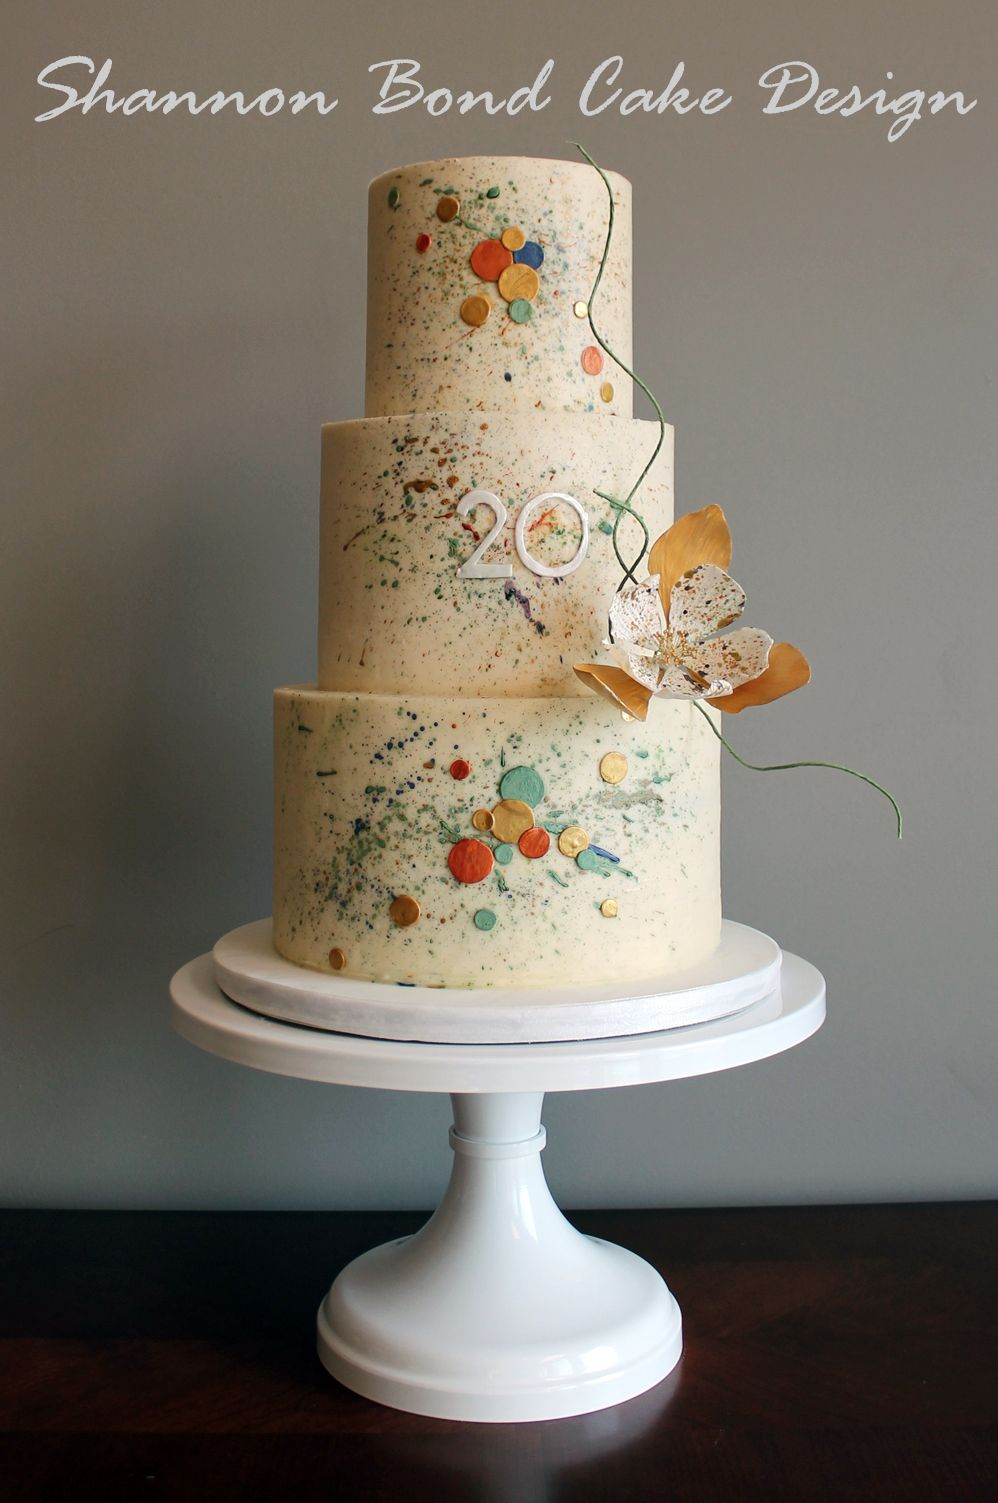 Abstract Art Cake Design